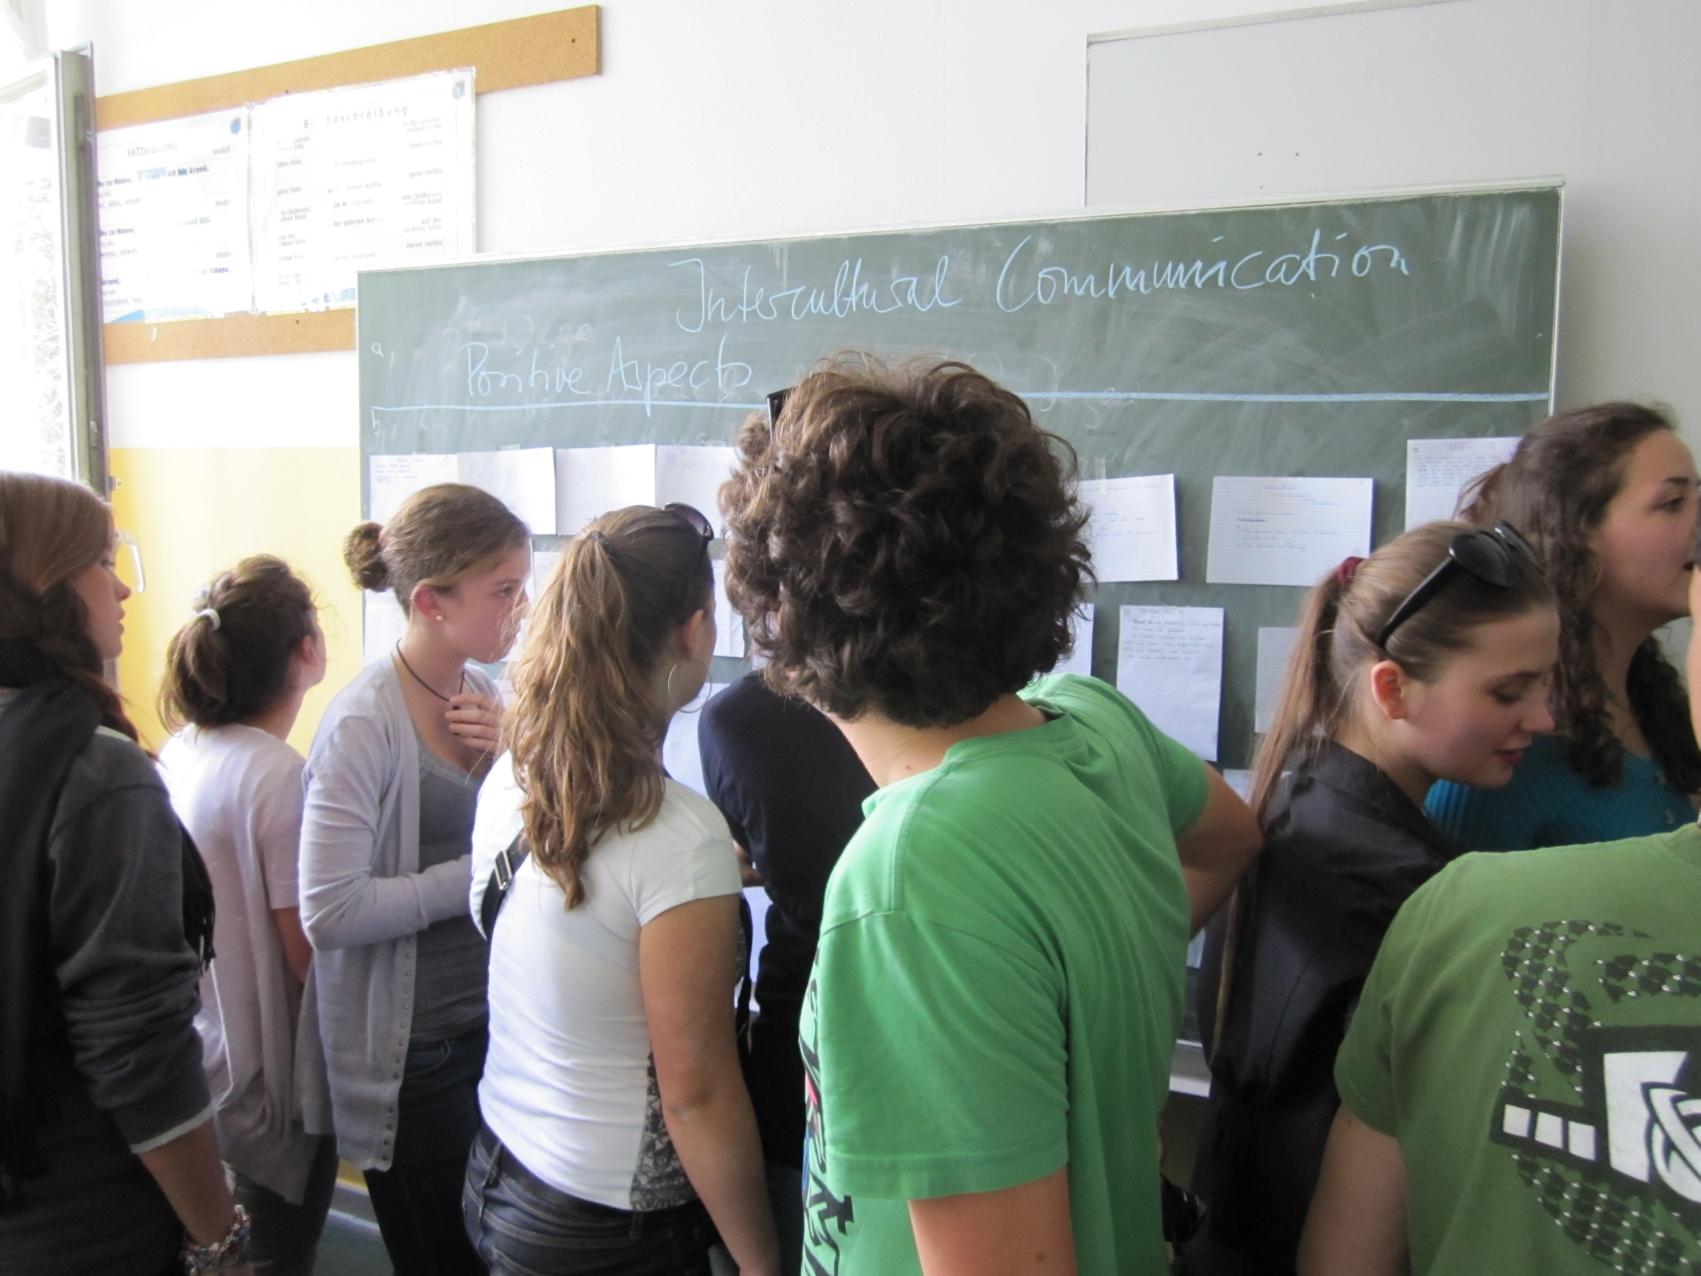 tdu-Meeting 2010 bio-rom